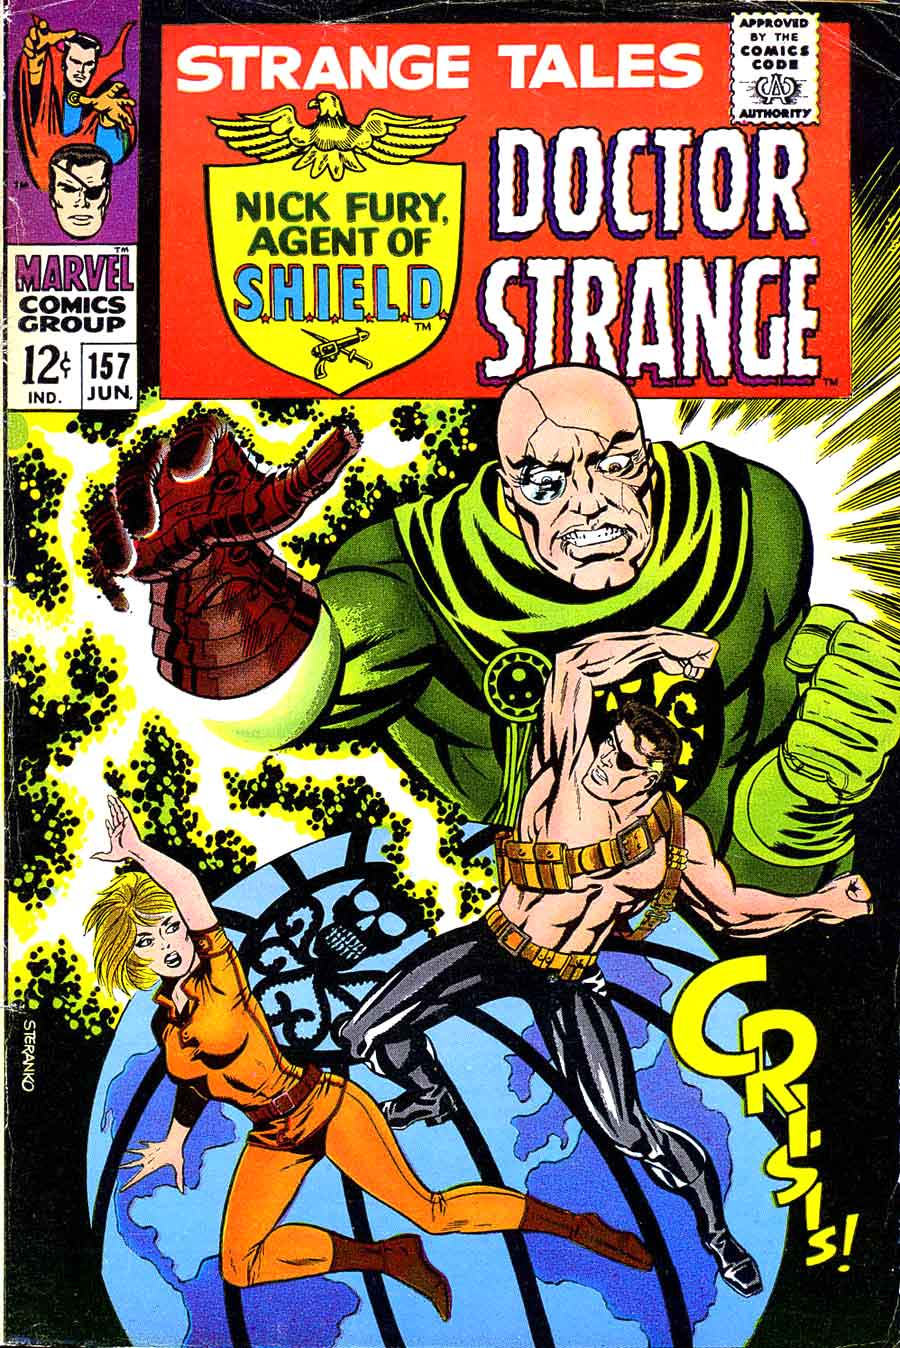 Jim Steranko nick fury shield marvel silver age 1960s comic book cover - Strange Tales #157